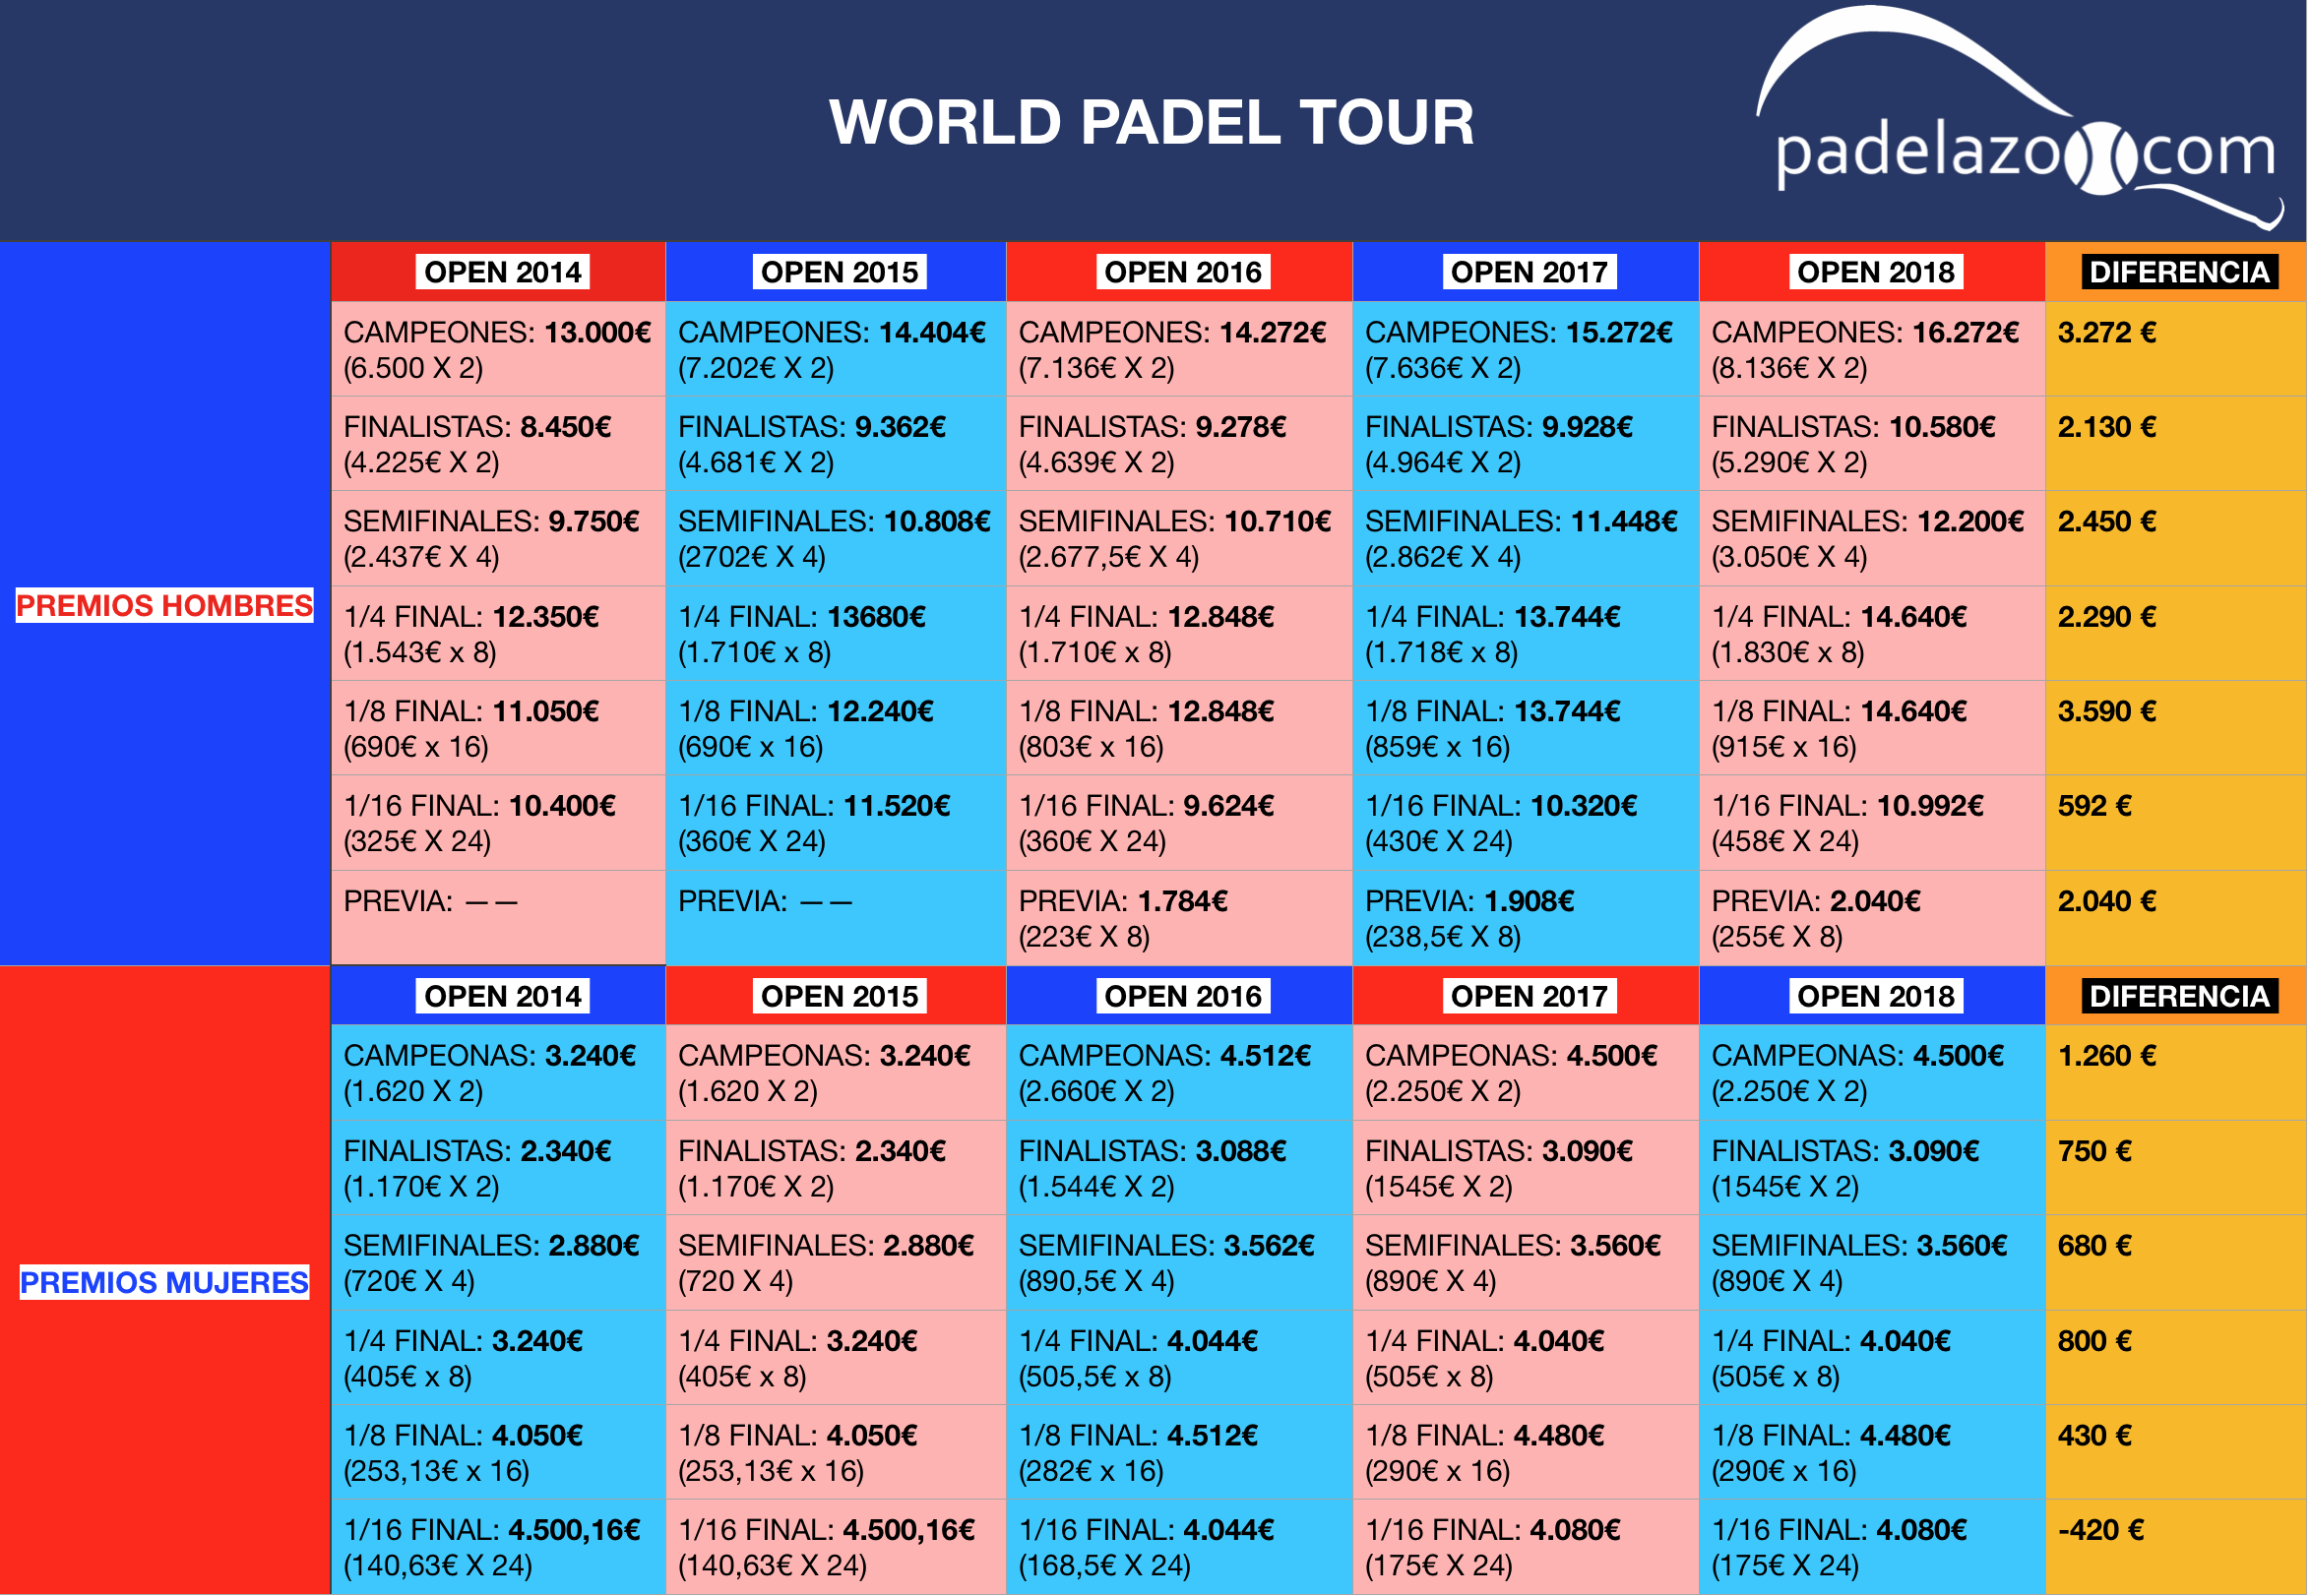 comparativa premios open world padel tour masculino y femenino 2018